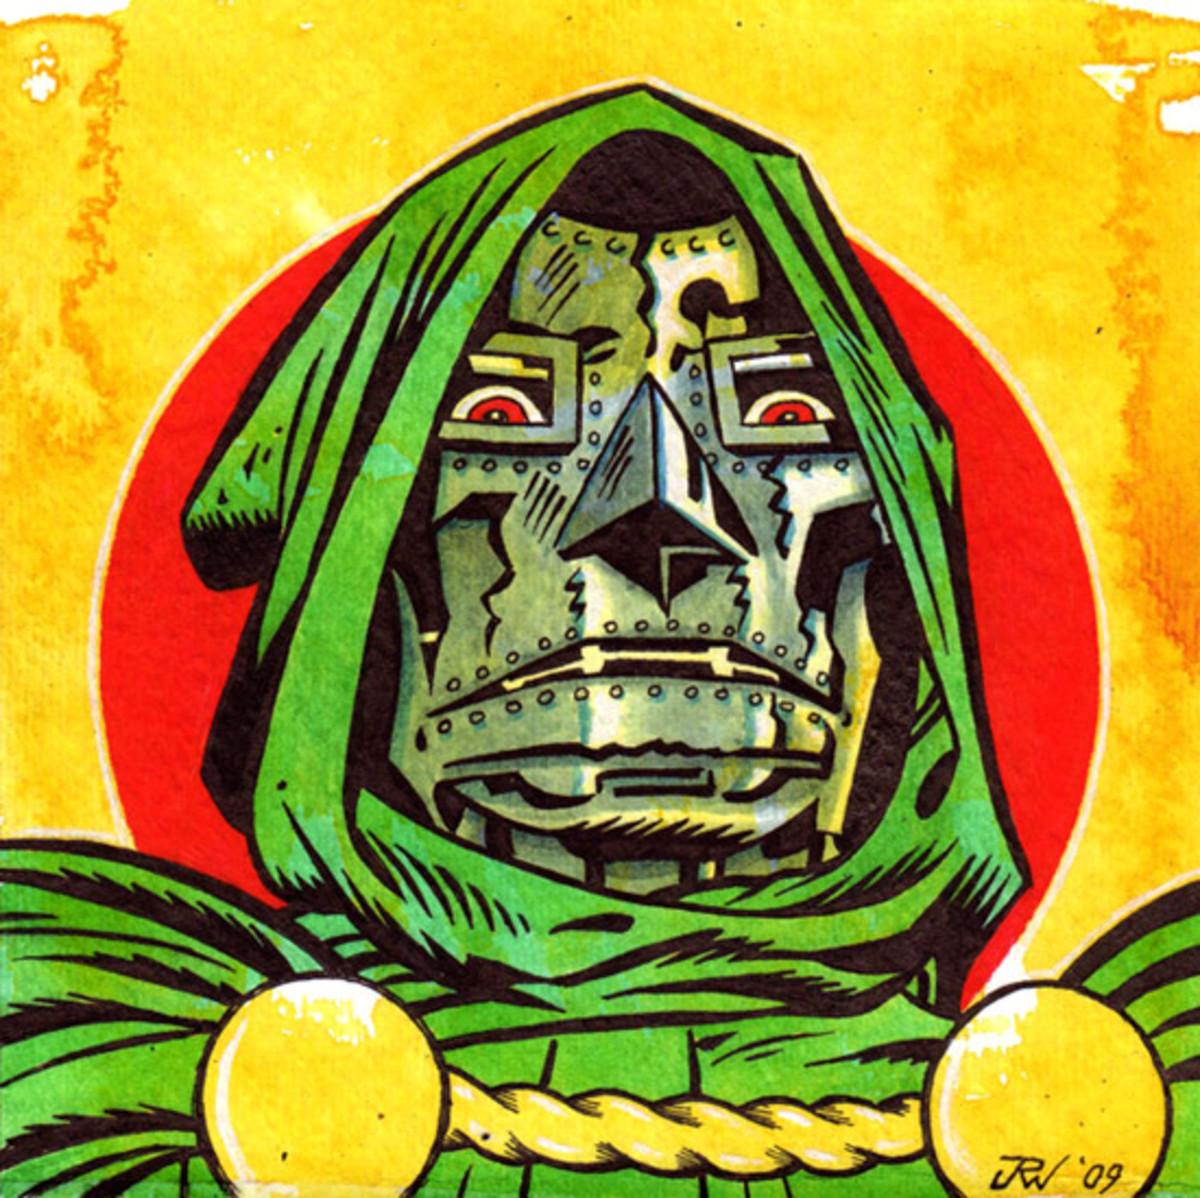 Victor Von Doom, aka Doctor Doom